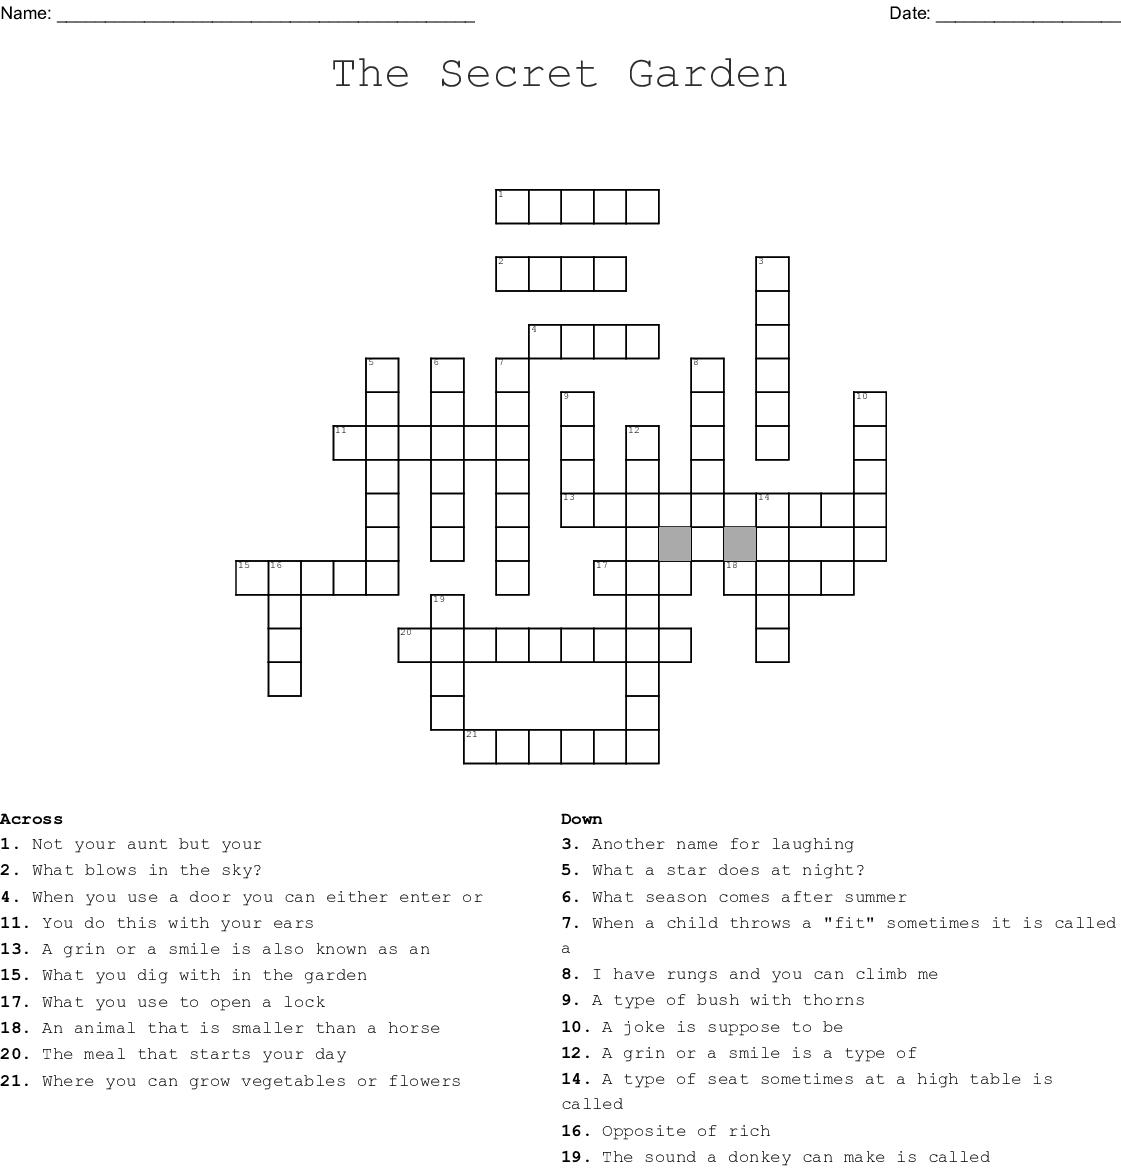 The Secret Garden Crossword